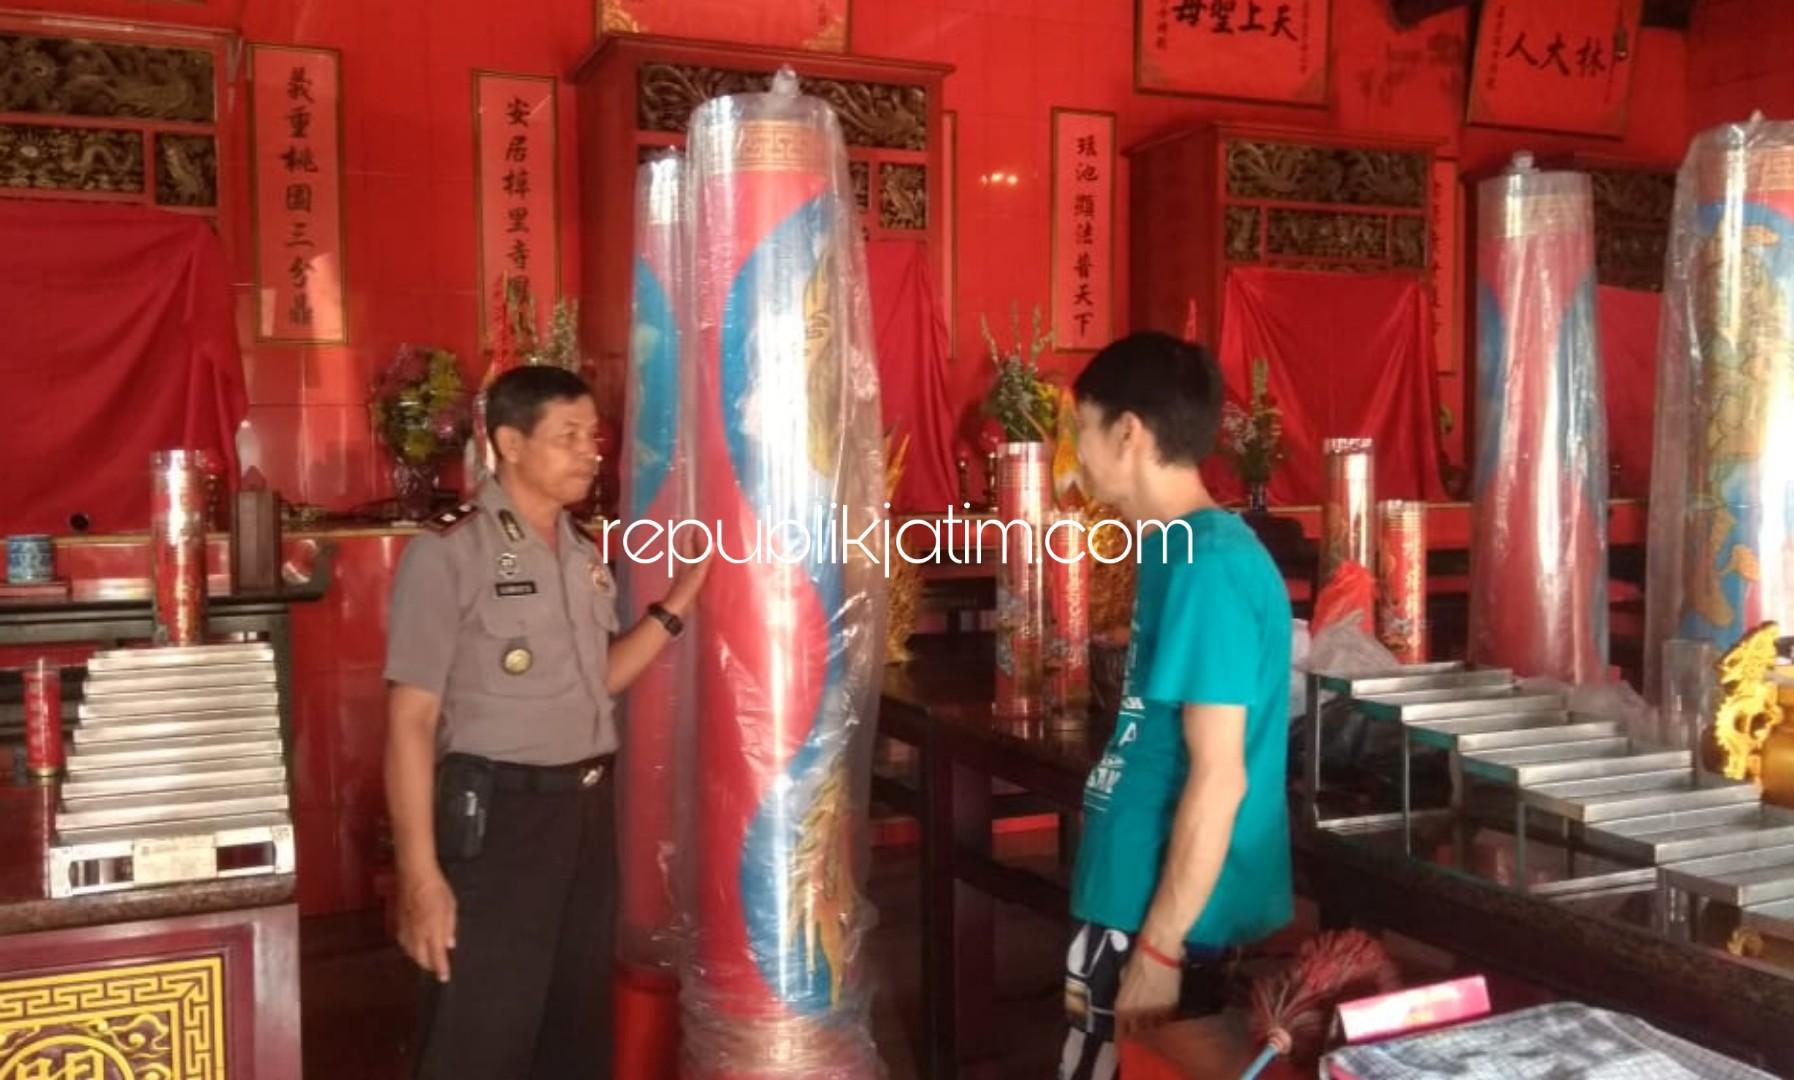 Jelang Imlek, Polisi Sterilisasi Sejumlah Klenteng di Sidoarjo